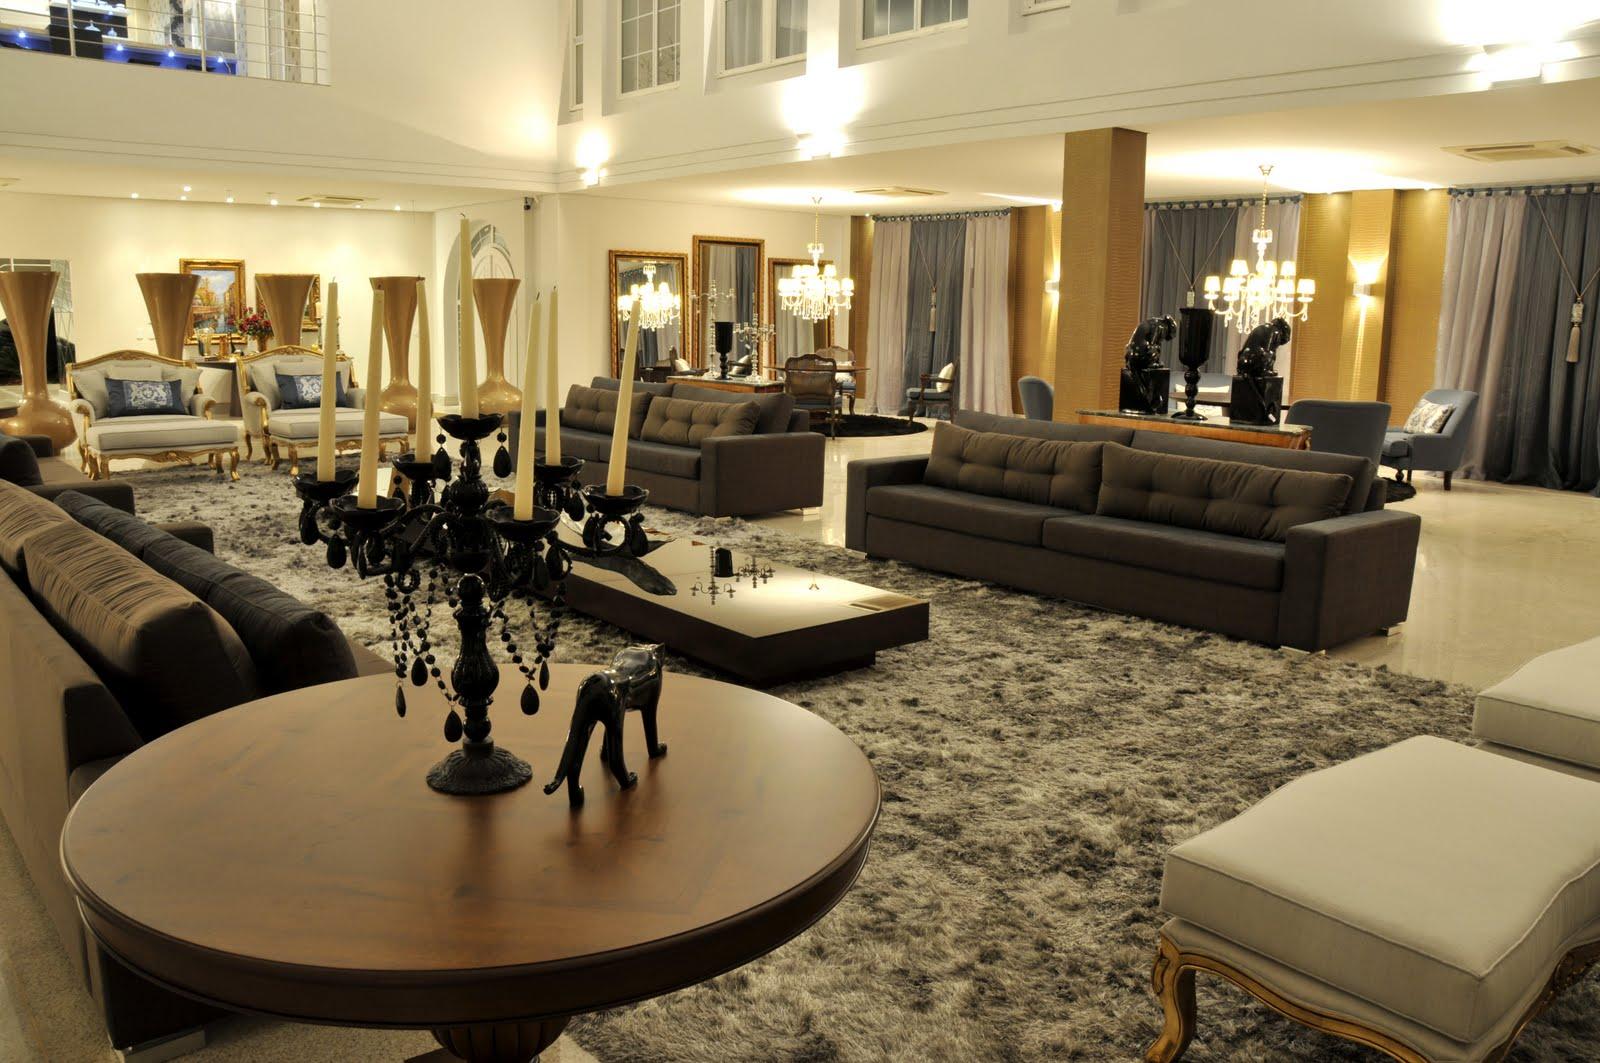 ... 20/06/10 - Sala de estar traz luxo e sofistica??o para a 3? Mosarq